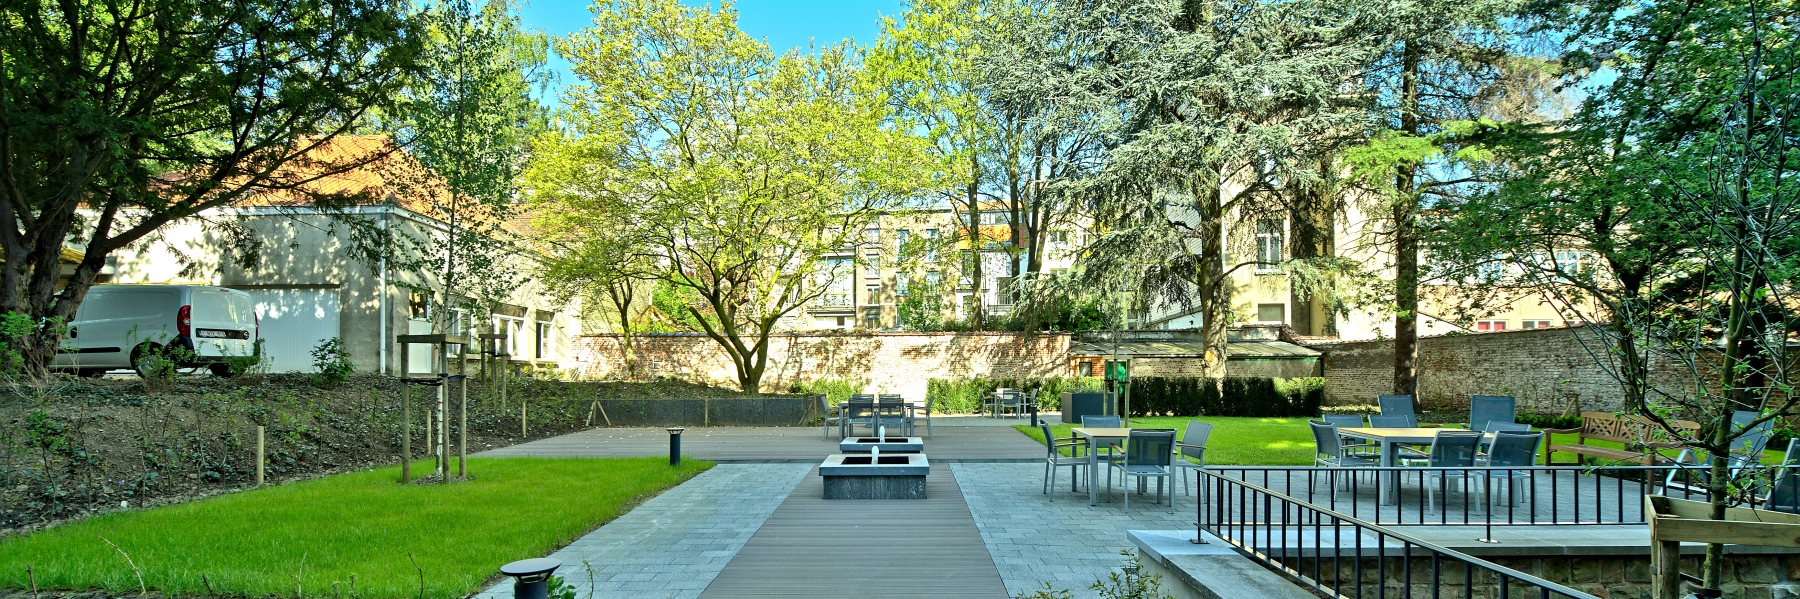 Résidence du Puy Ixelles